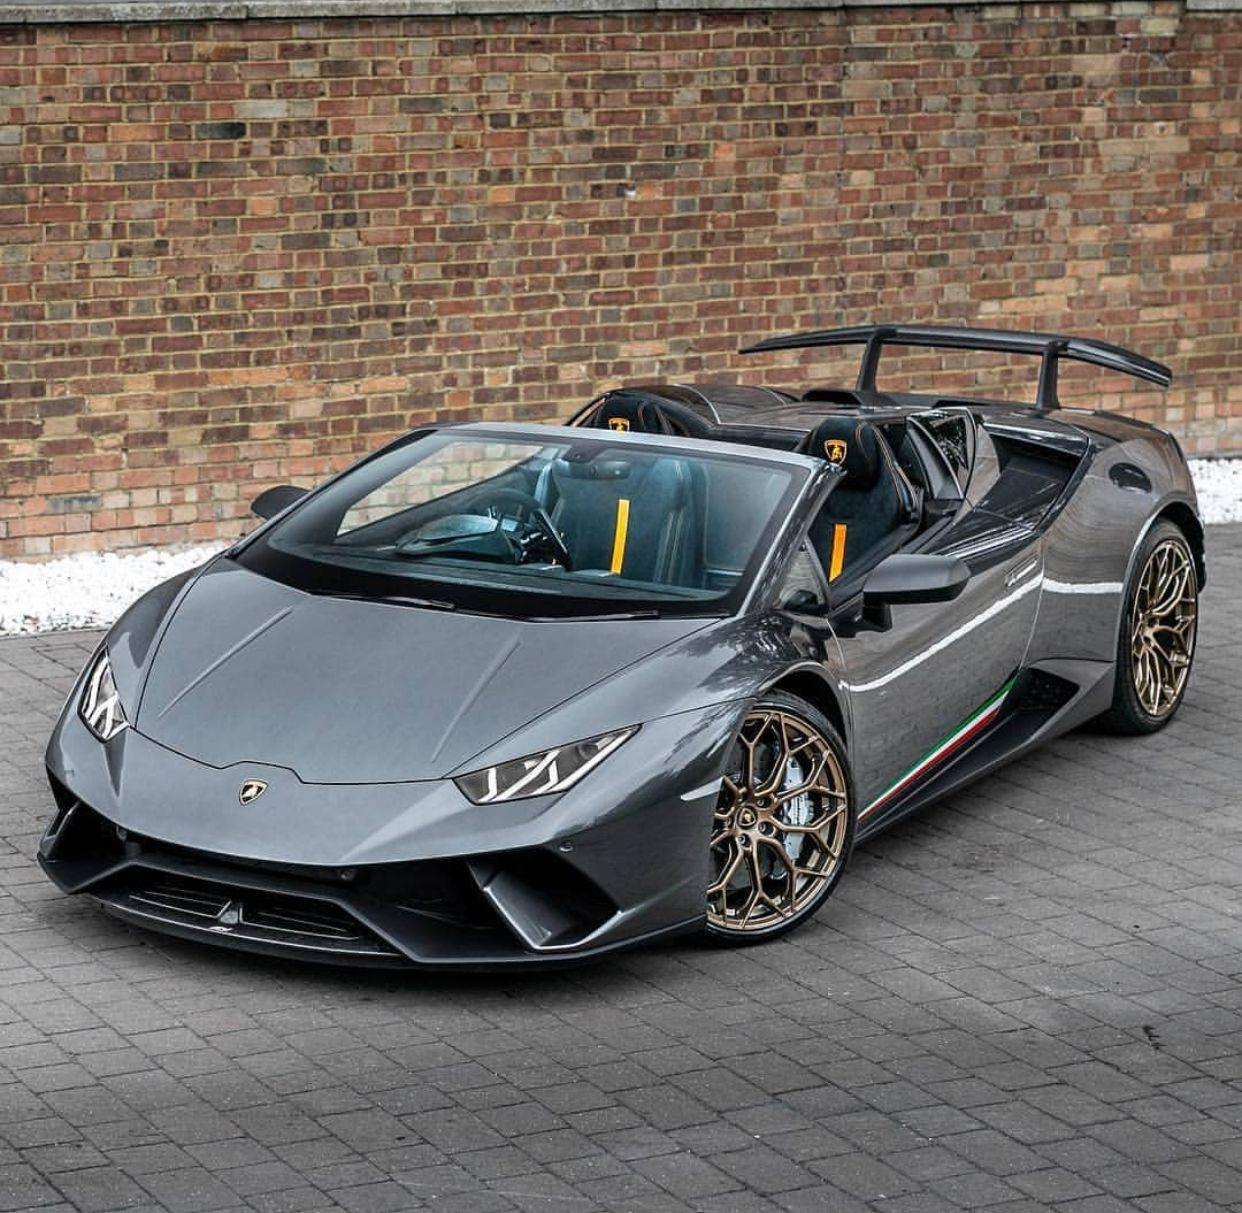 Spyder Sports Car: Lamborghini Huracan Perfomante Spyder LP 640-4